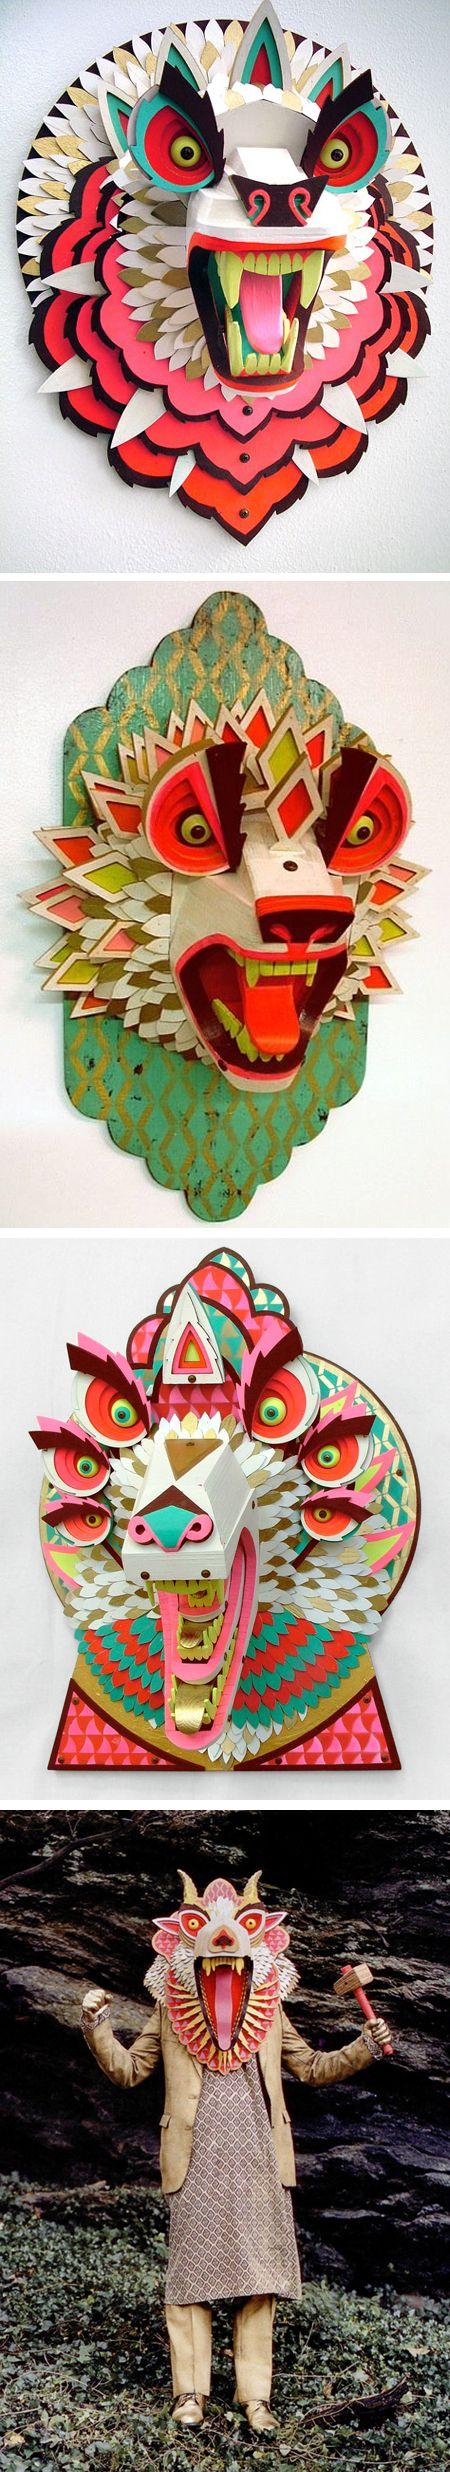 aj fosikAj Fosik1, Wood Masks, Wooden Masks, Paper Masks, Amazing Wood, Paper Art, Asian Masks, Disguise Artists, Ajfosik